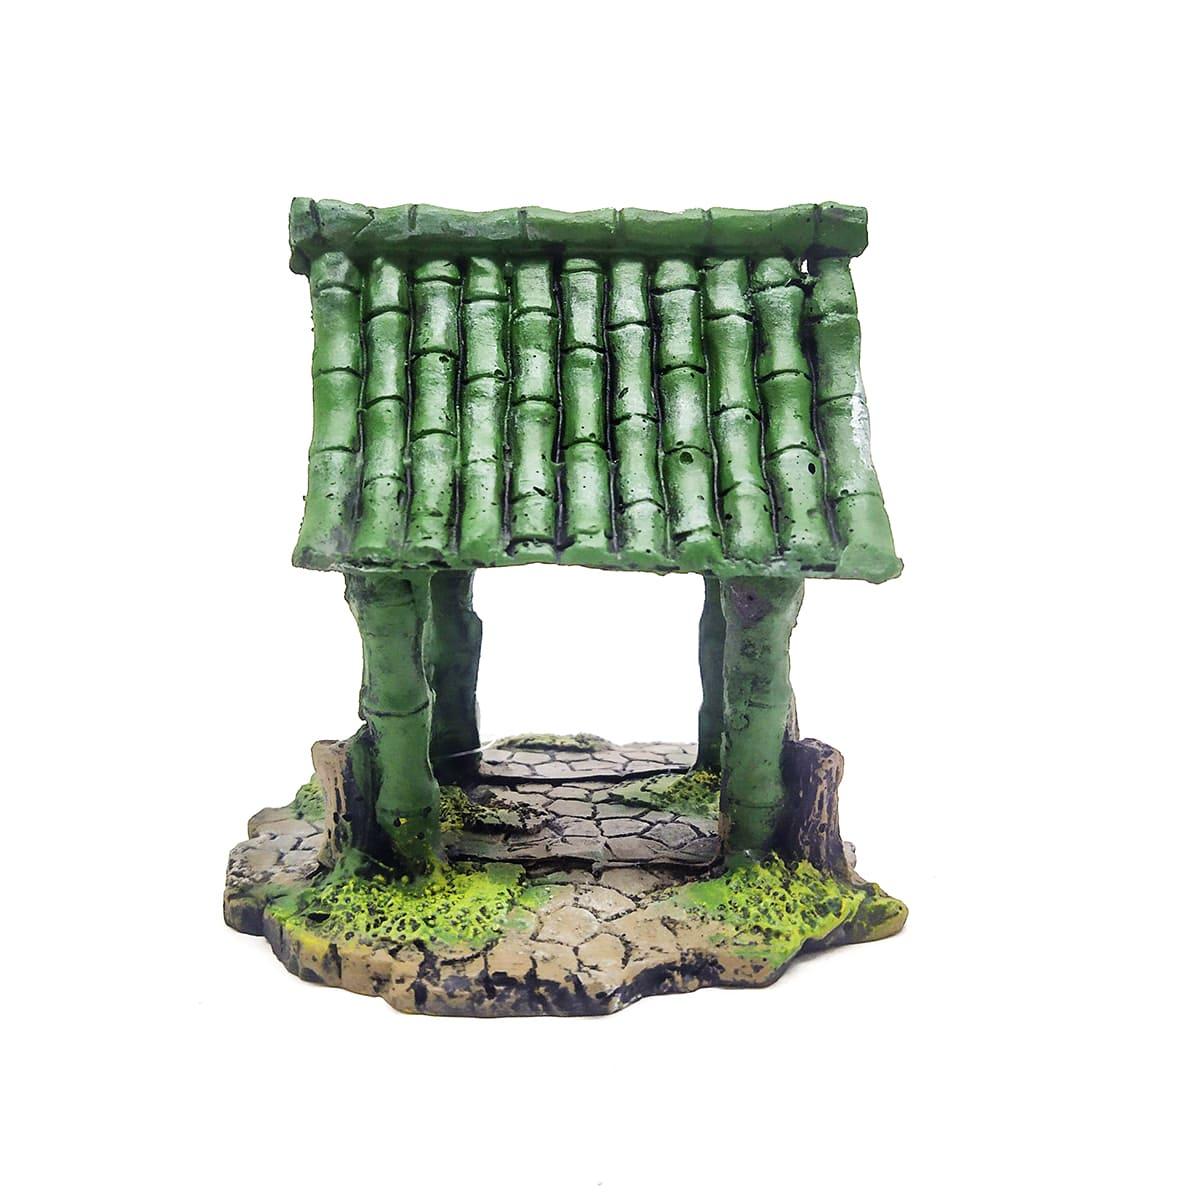 Enfeite para Aquários Cabana de Bamboo - Fragata Ornamentos